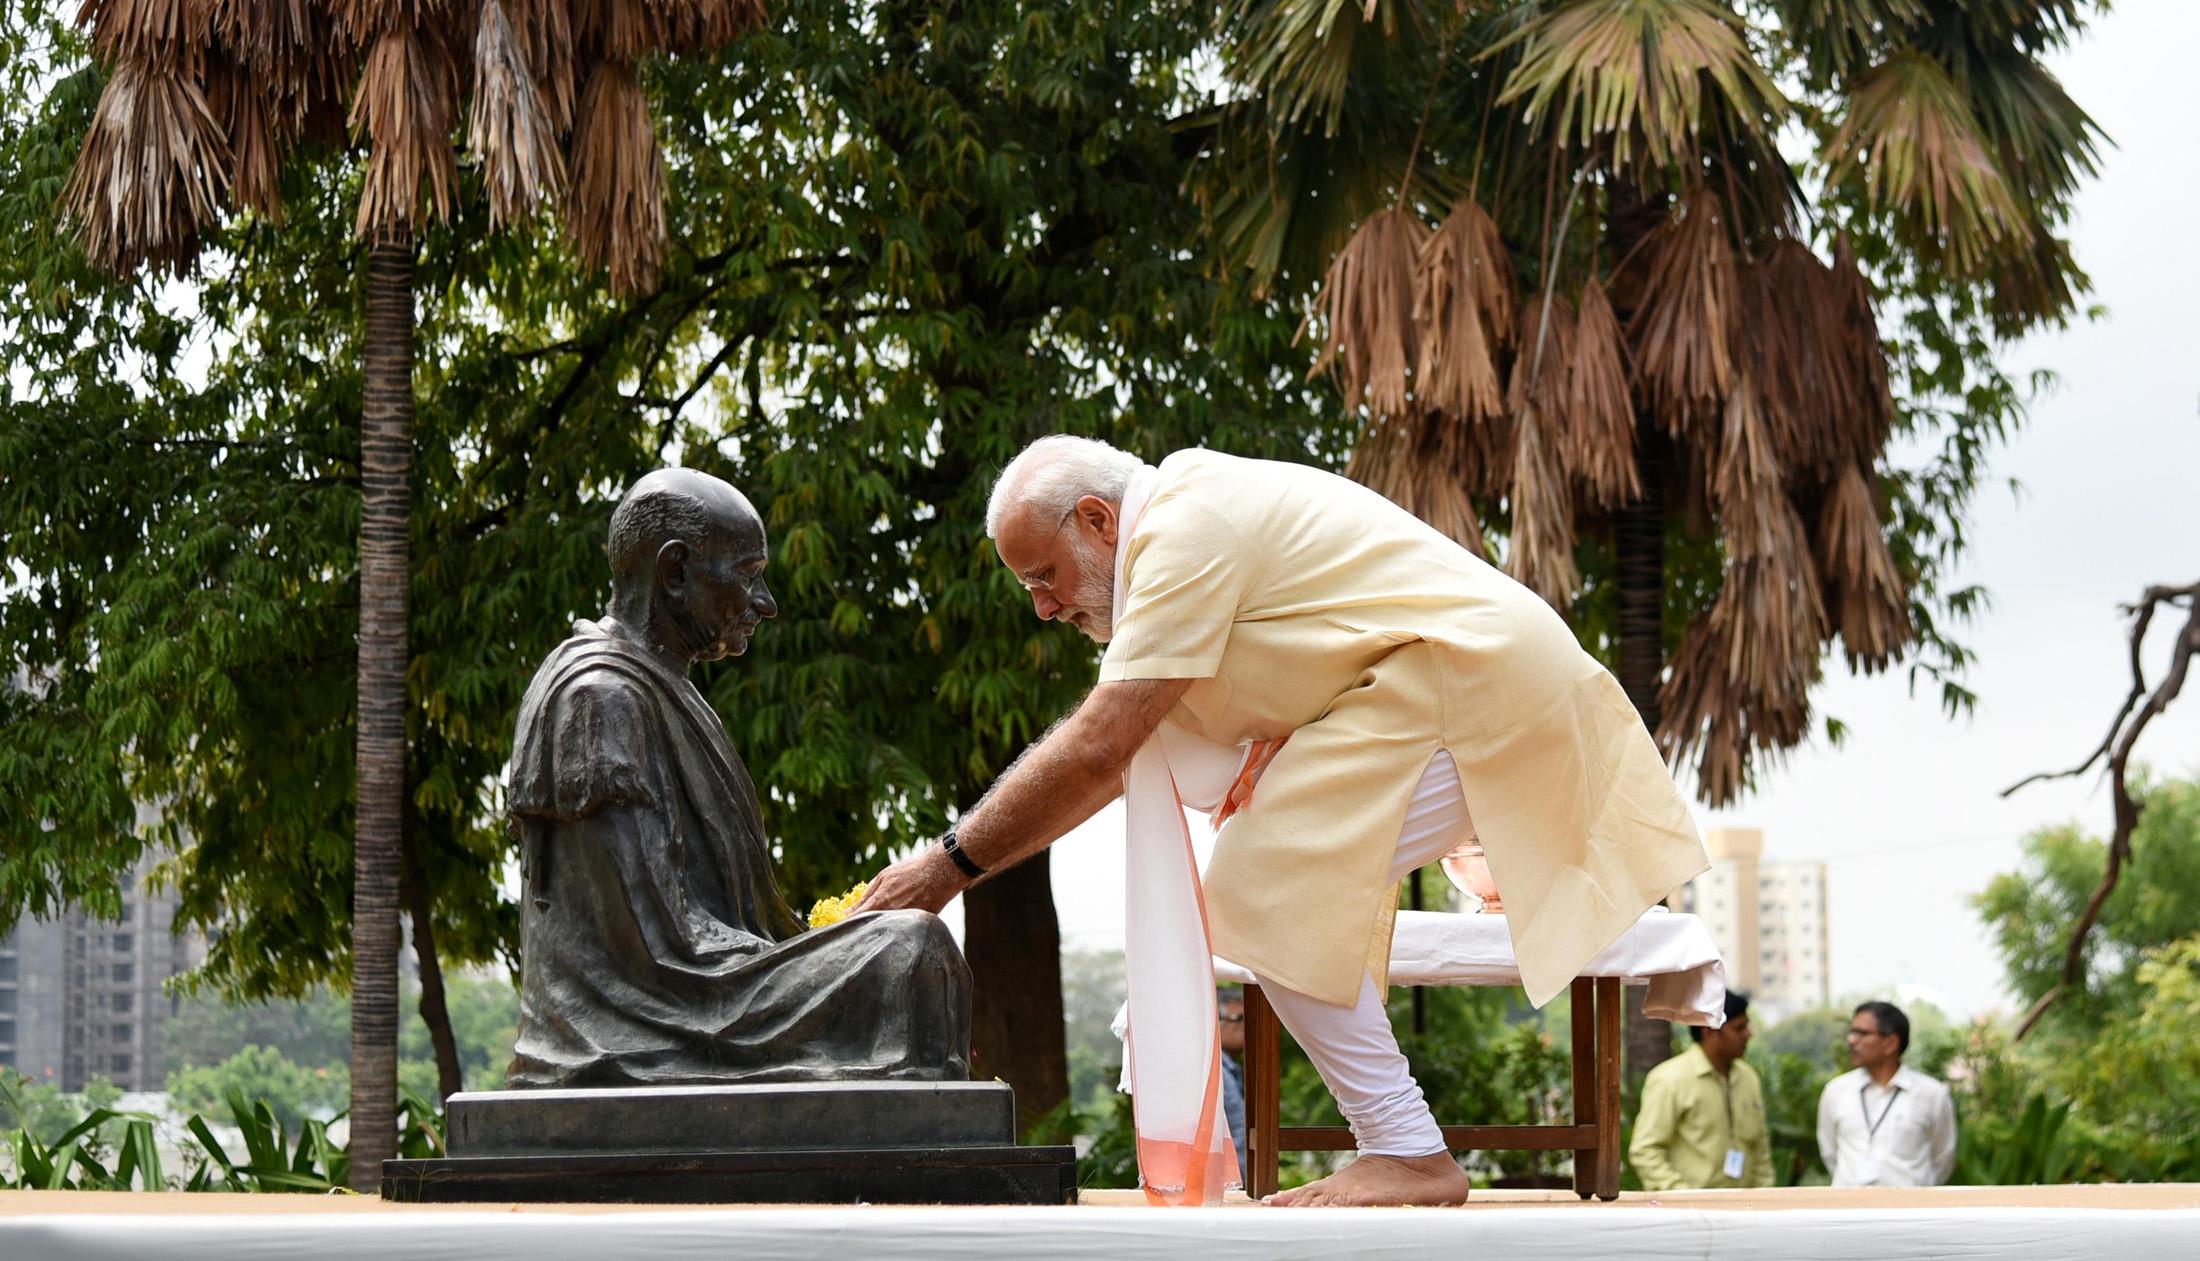 The Prime Minister, Shri Narendra Modi offers flower petals at Mahatma Gandhi bust, at the Sabarmati Ashram, in Ahmedabad, Gujarat on June 29, 2017.